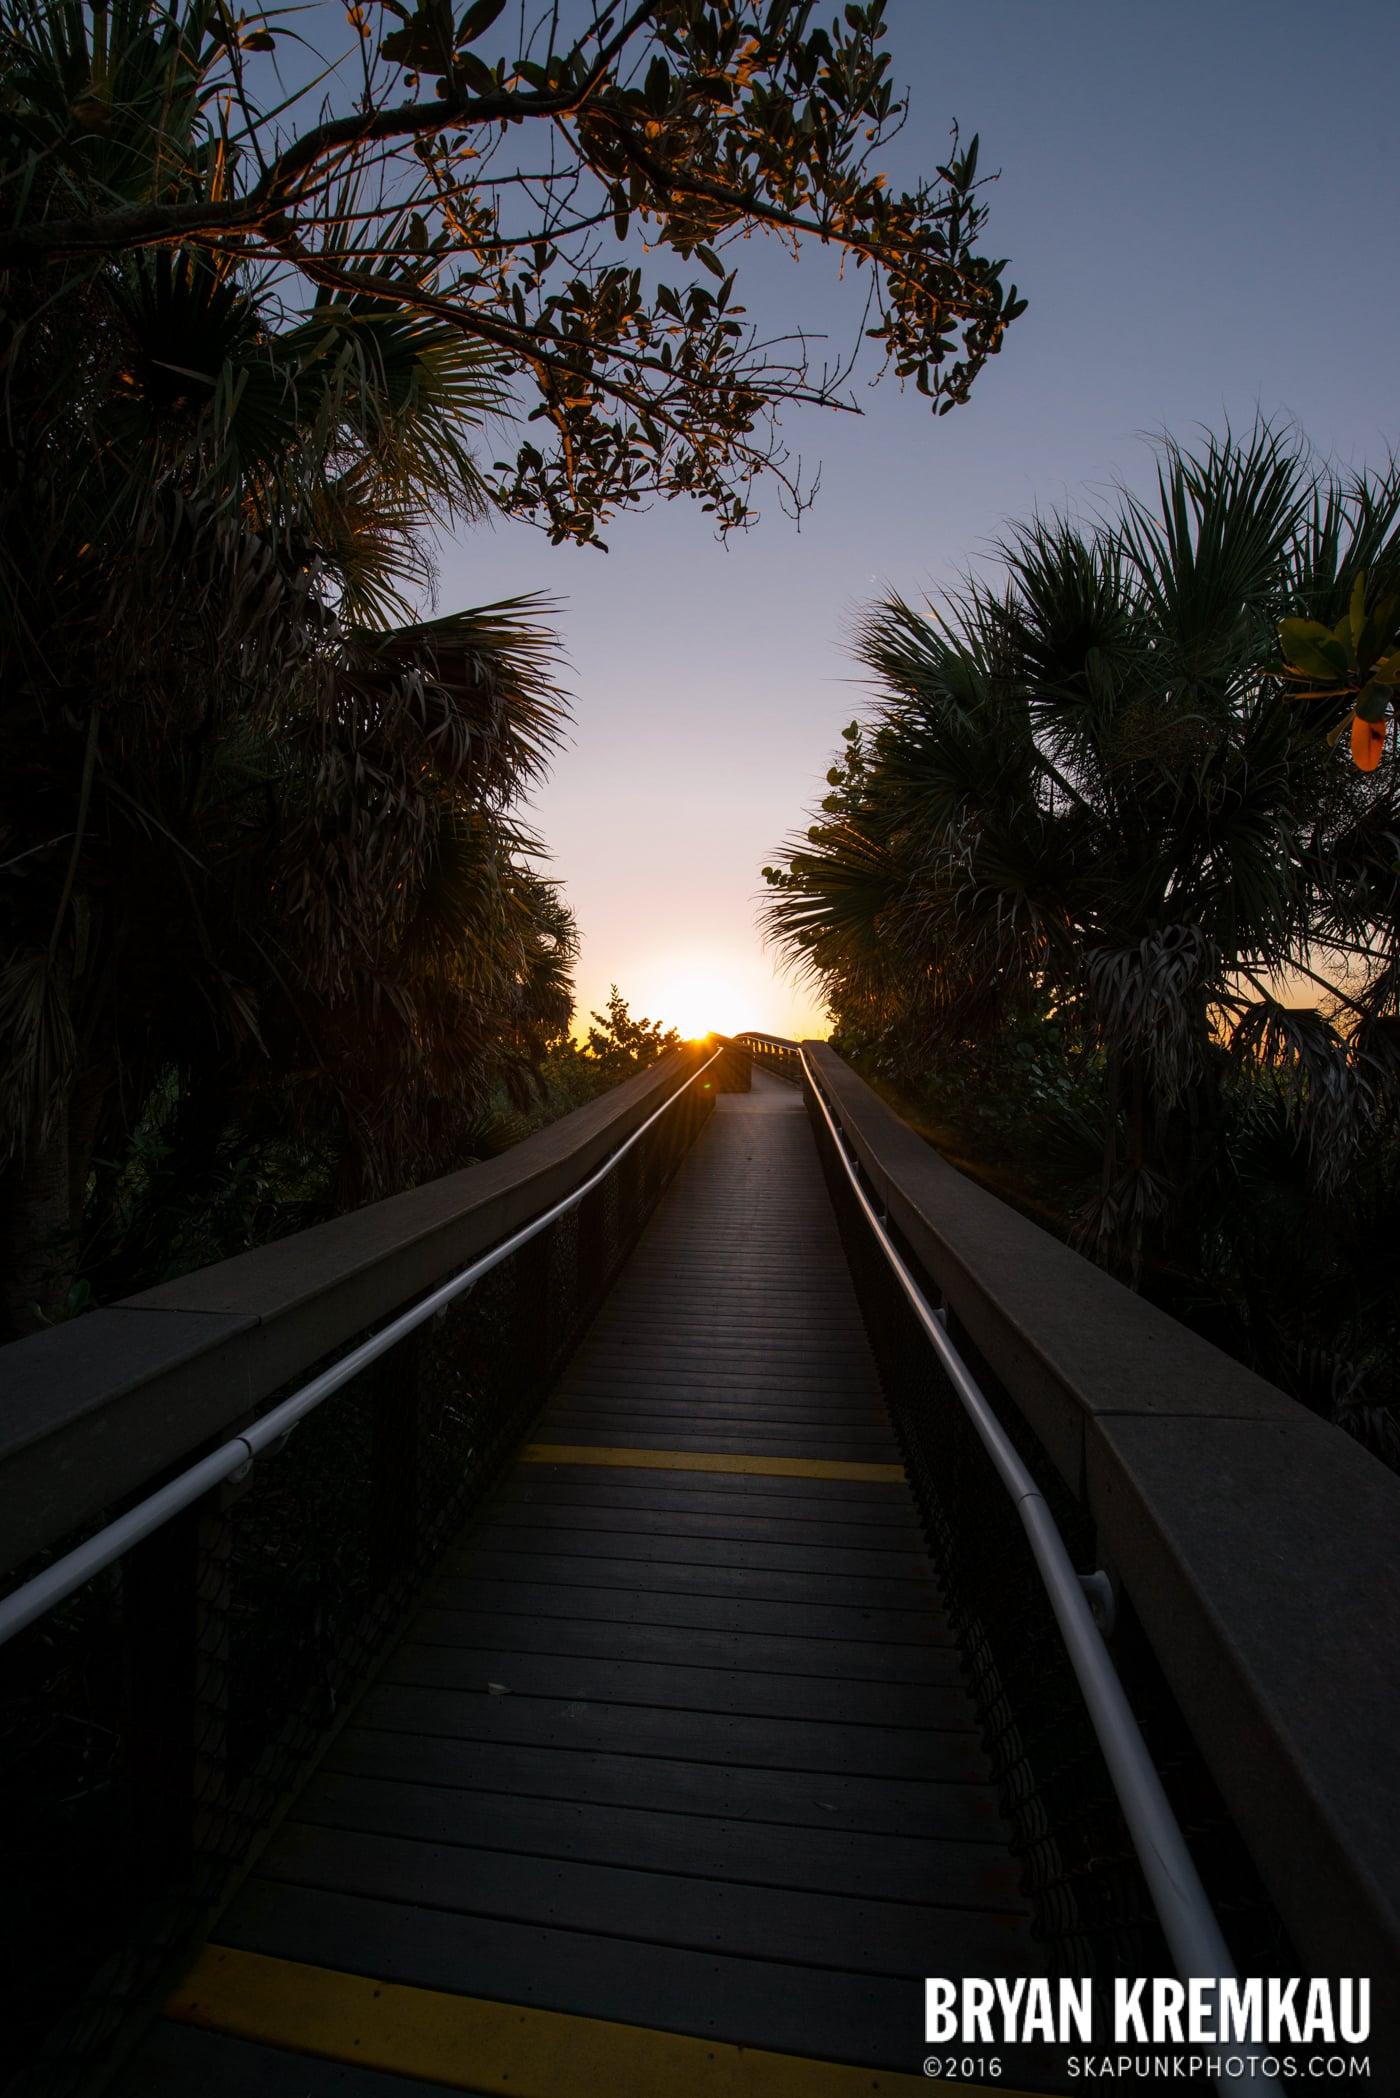 Sunsets, Astrophotography & Birds @ Venice, Florida - 10.25.14 - 11.5.14 (103)